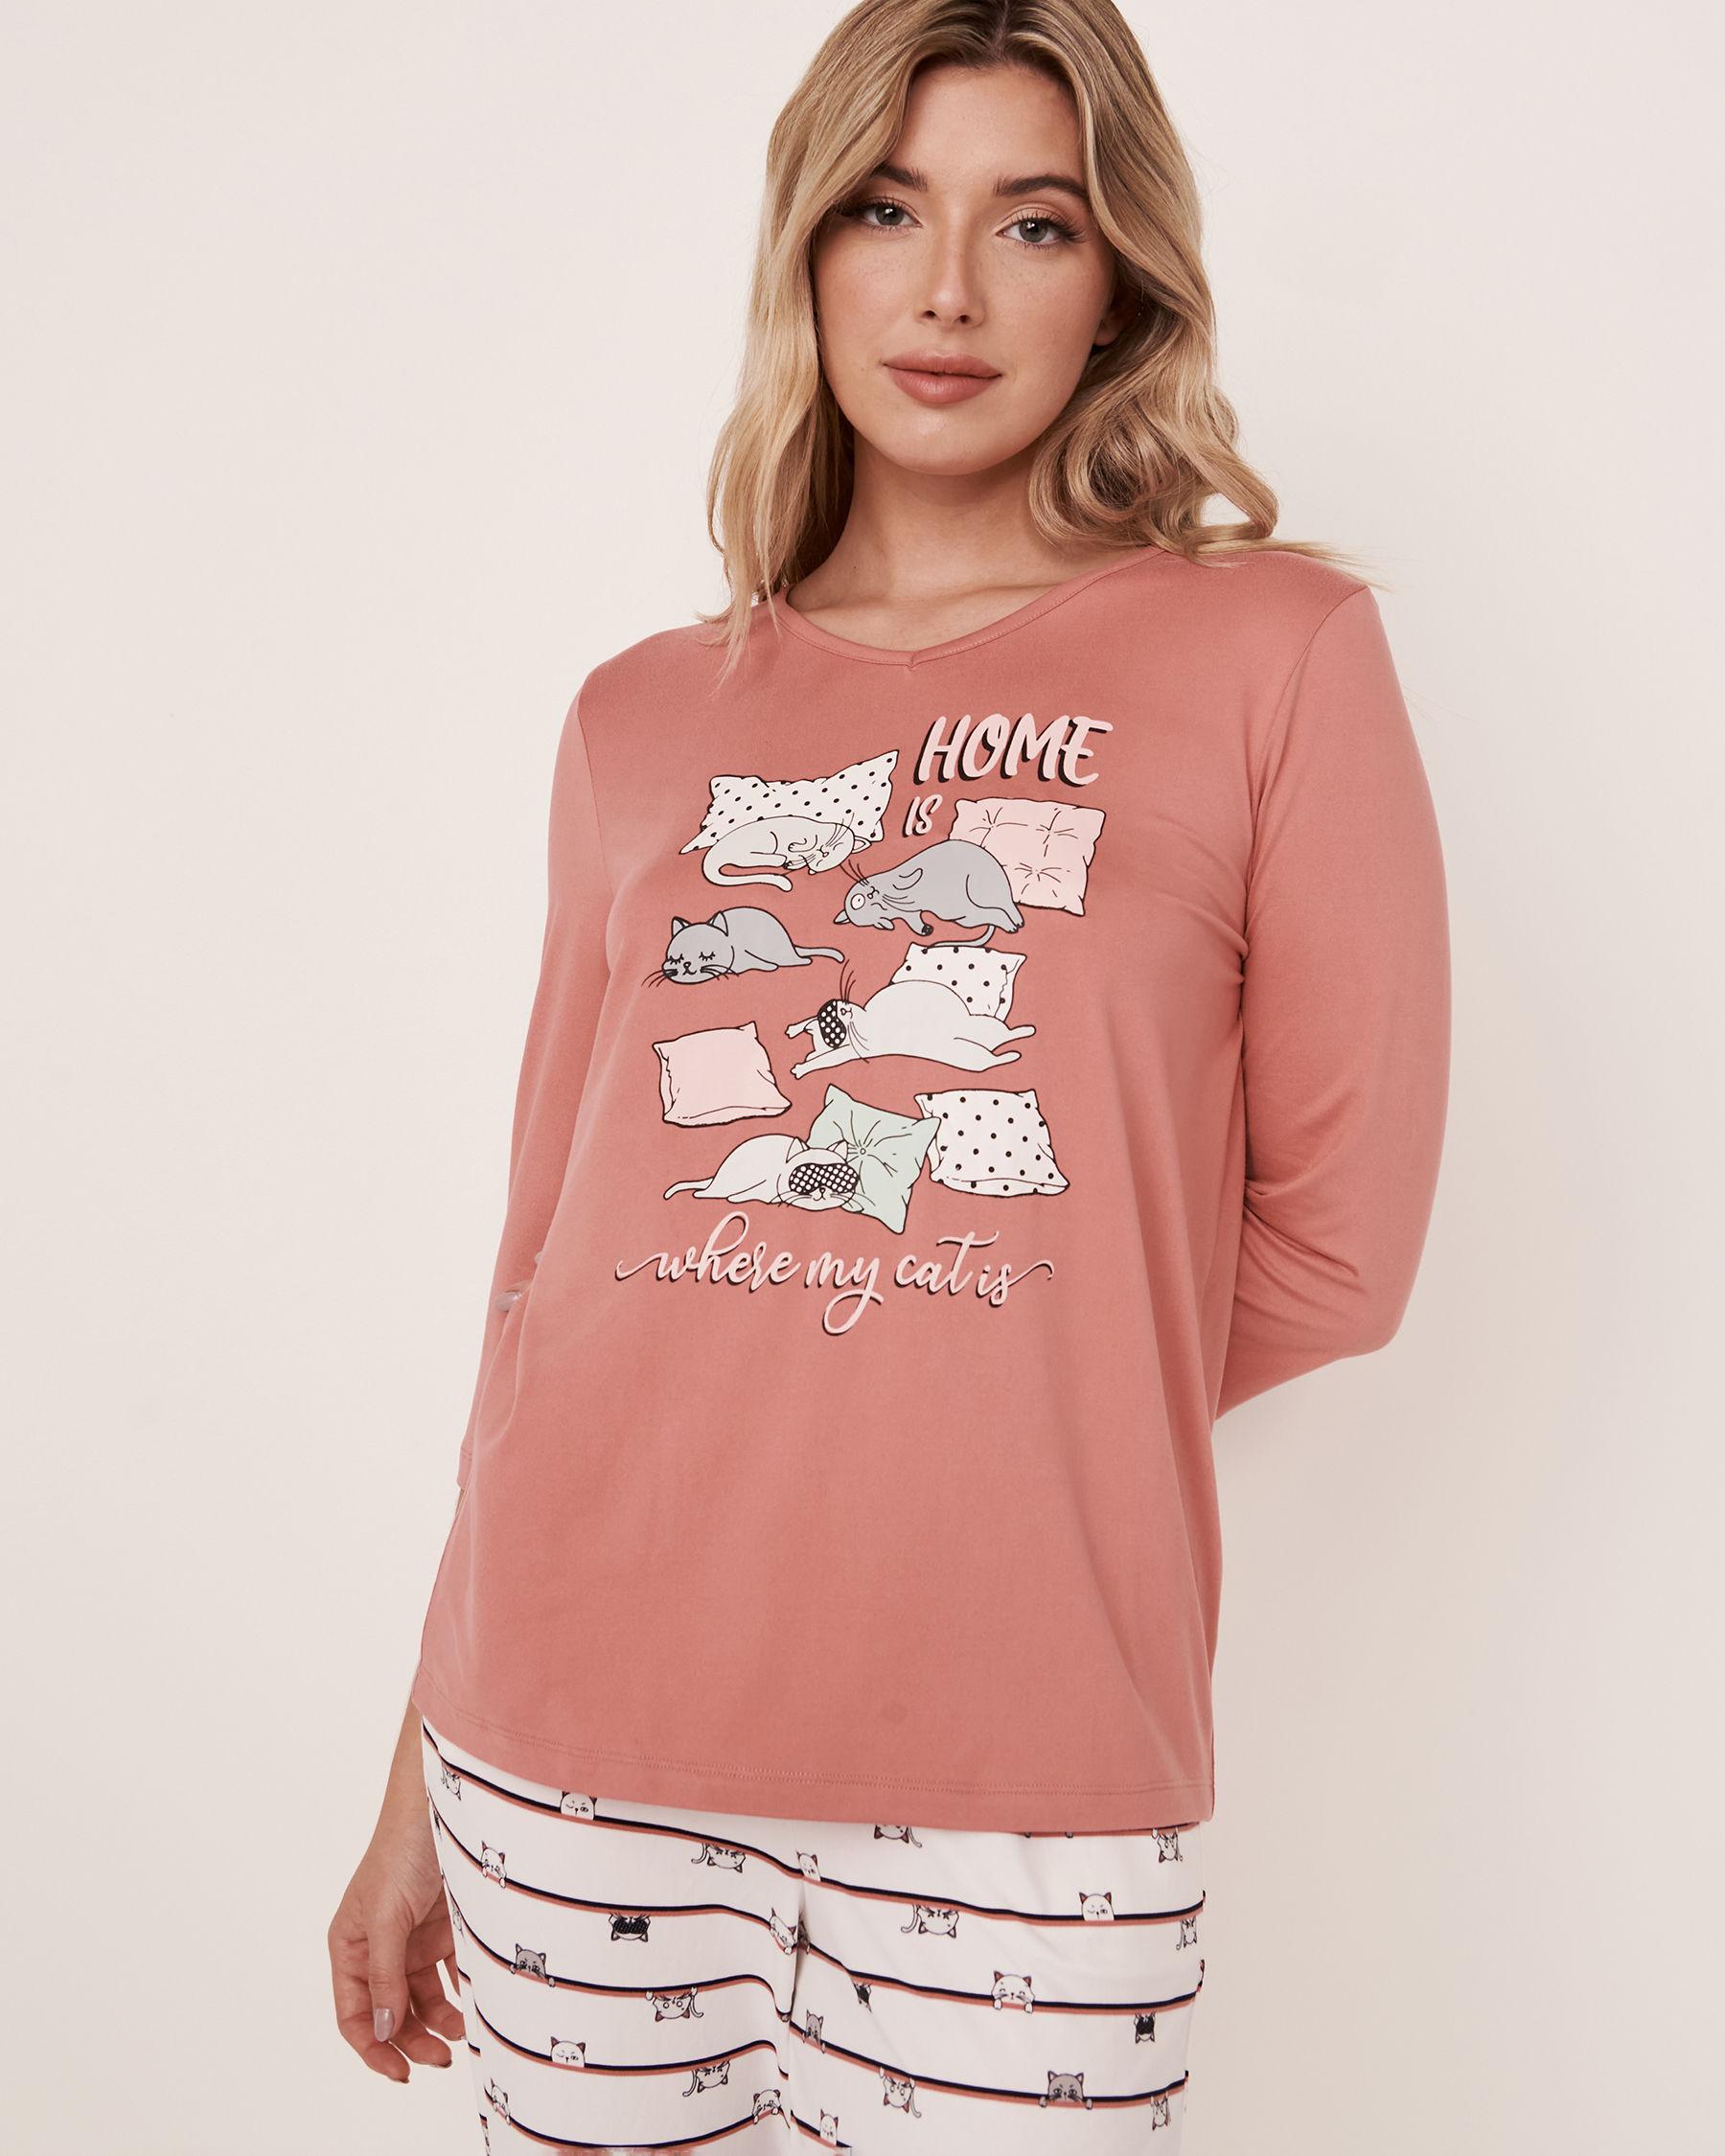 LA VIE EN ROSE V-neckline 3/4 Sleeve Shirt Dusty rose 40100087 - View1